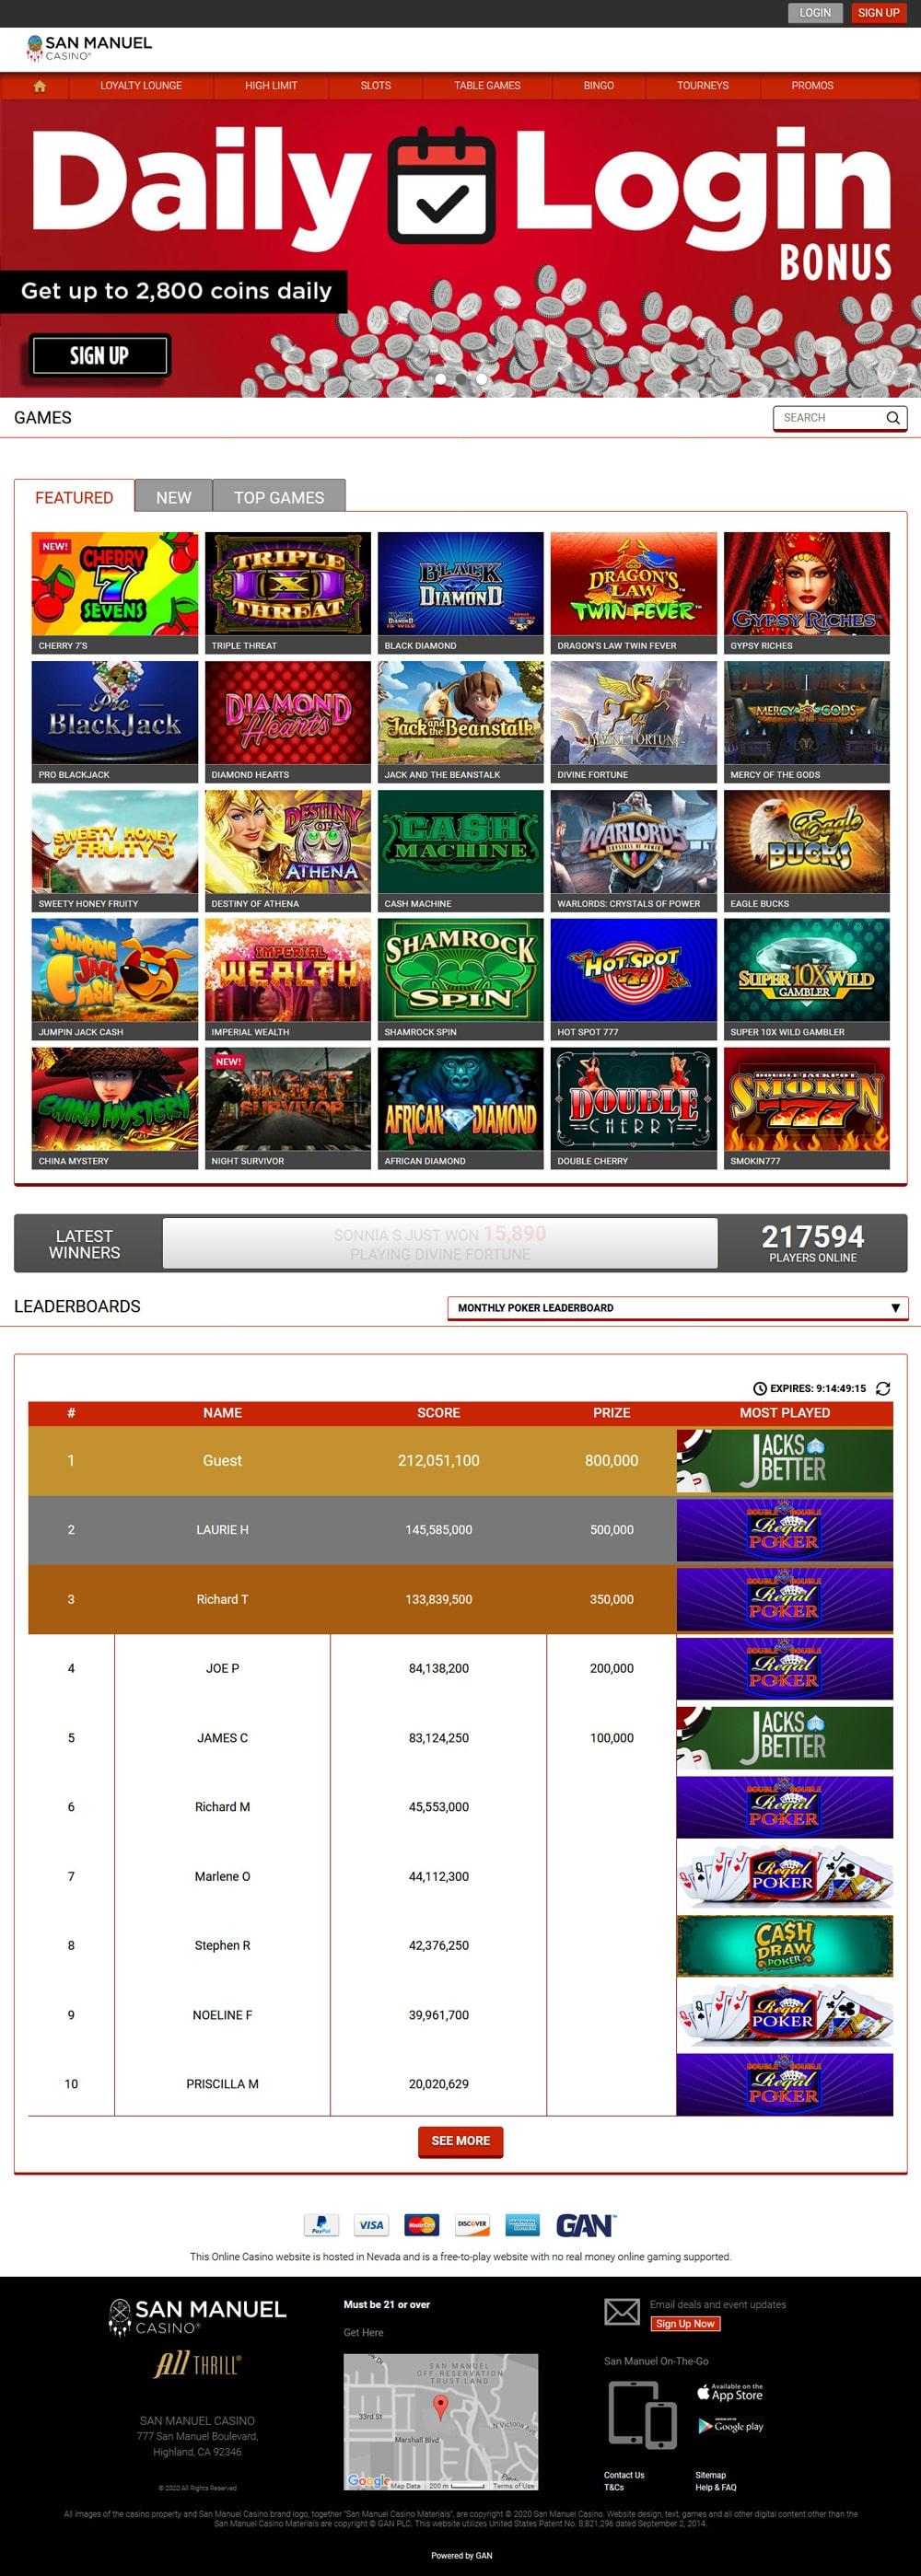 Play Free Slots Casino Games San Manuel Online